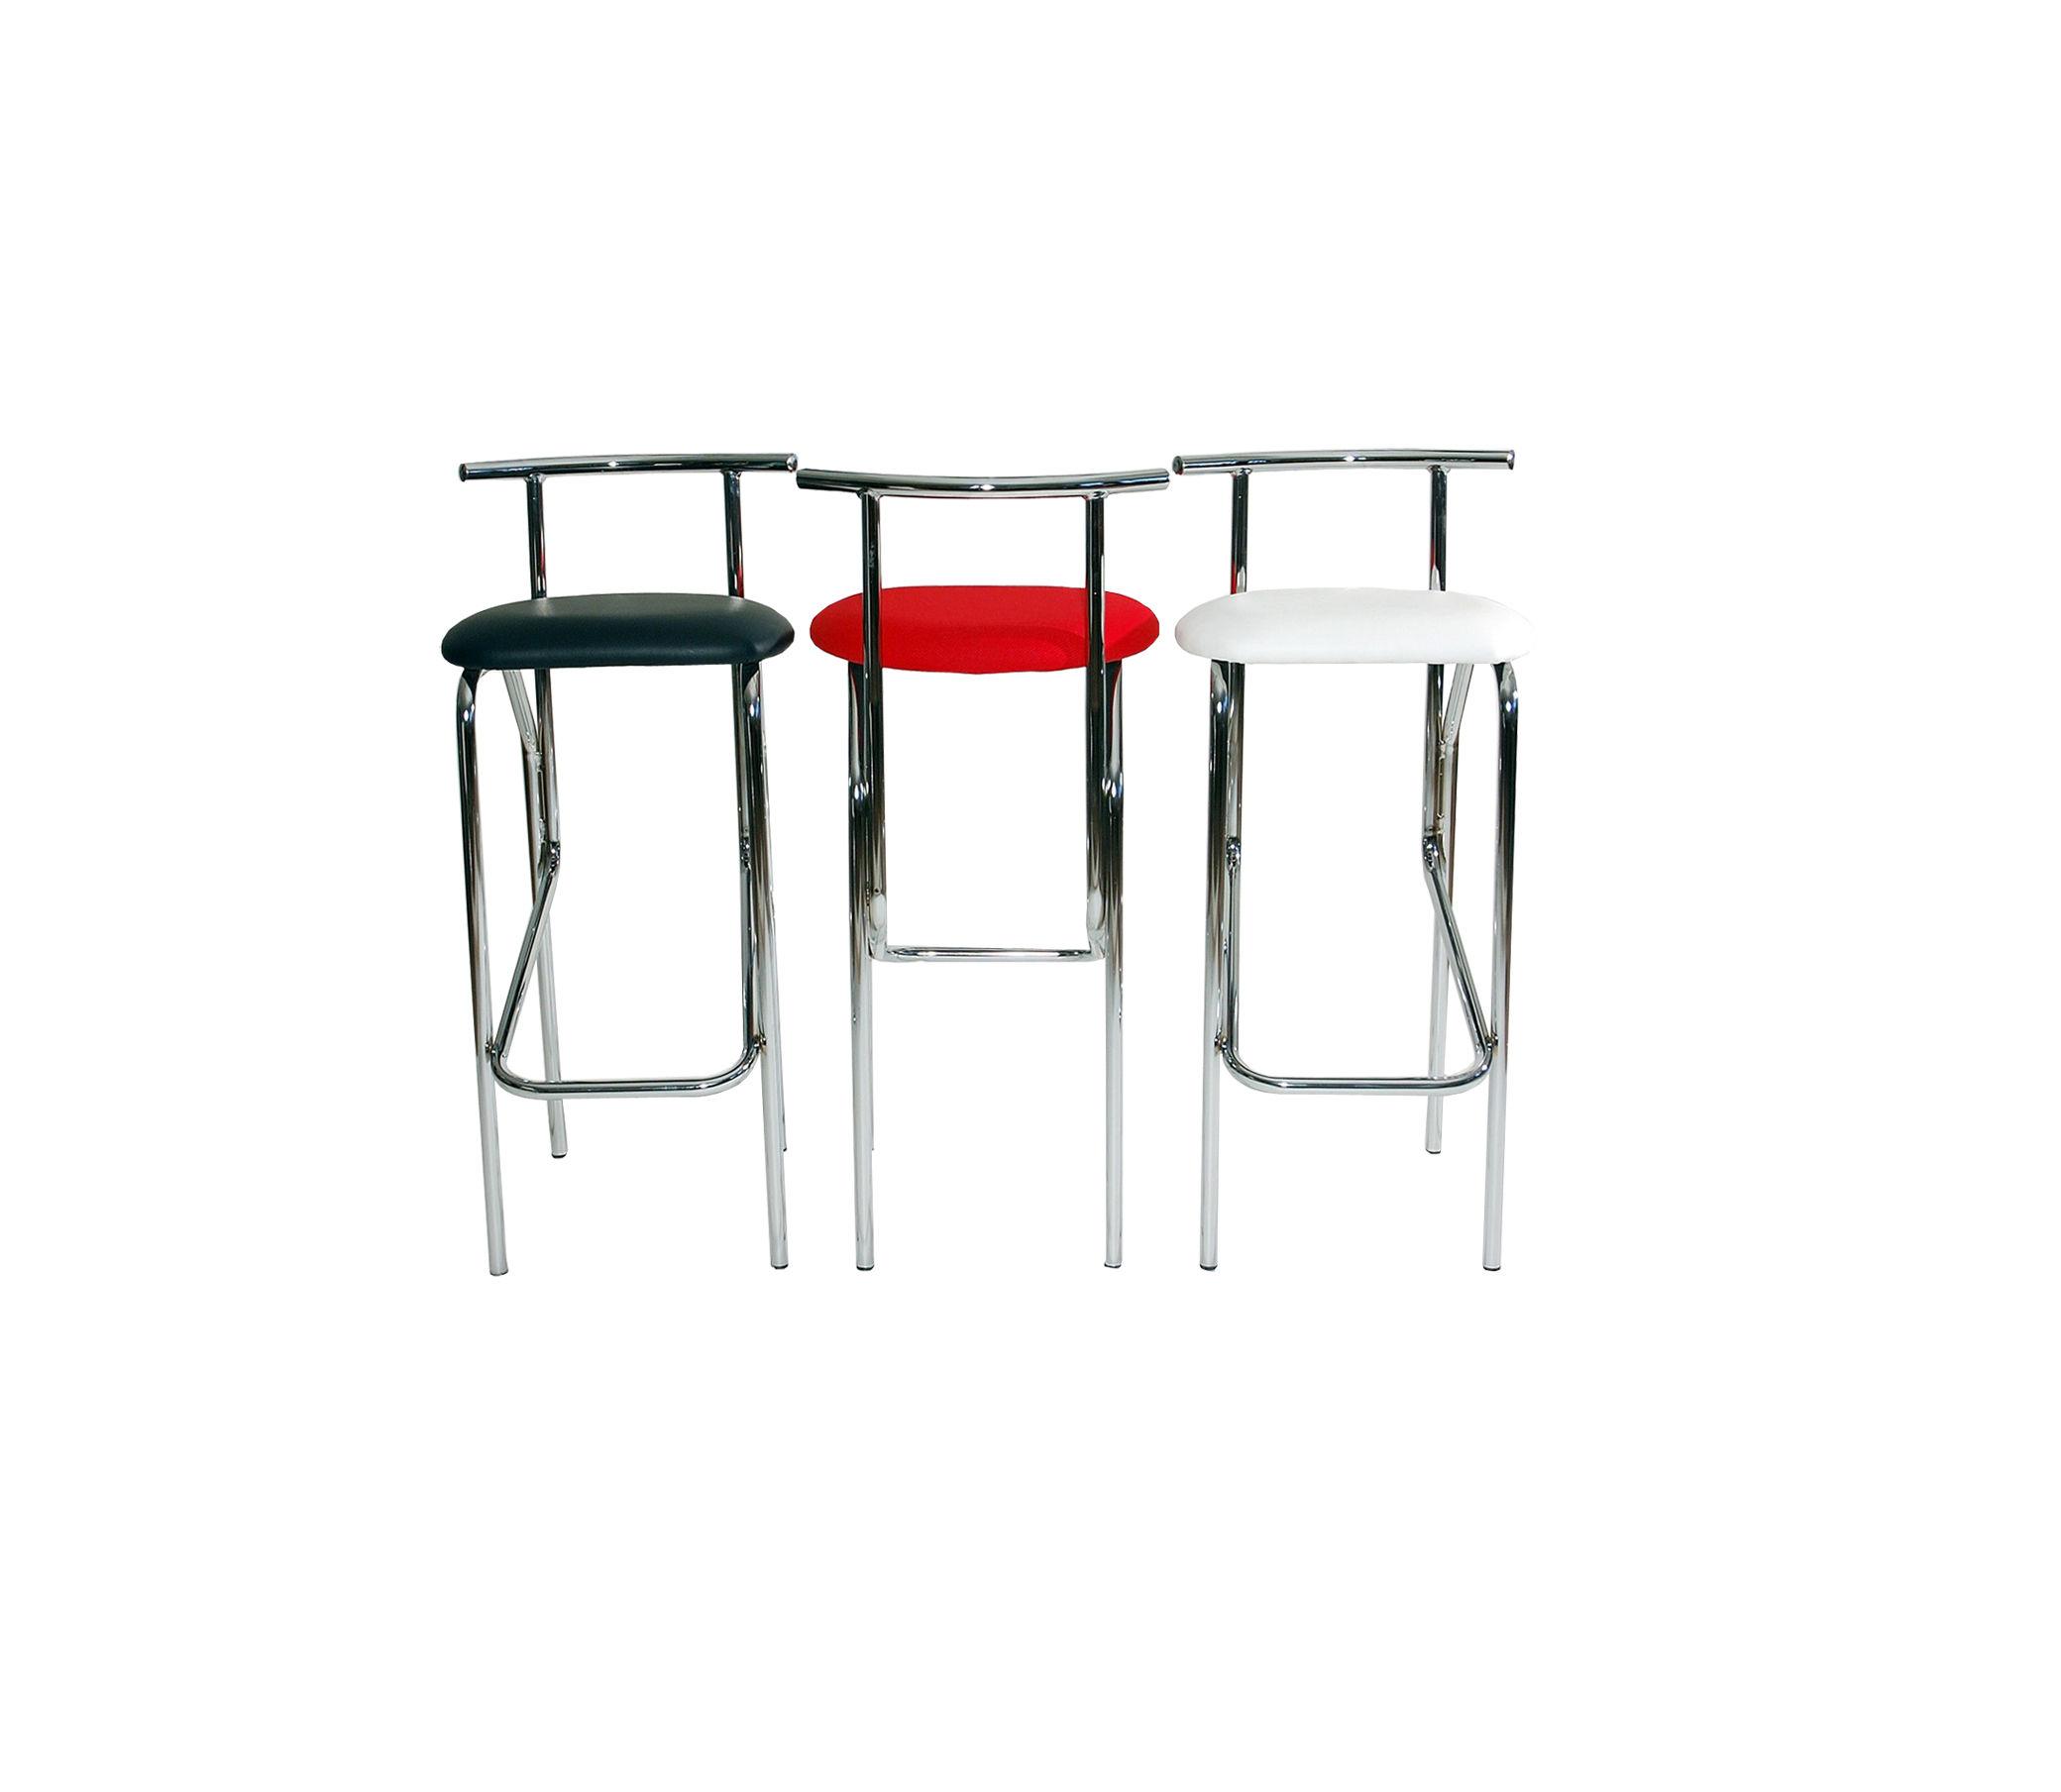 Luna: Alquiler de mobiliario de Stuhl Ibérica Alquiler de Mobiliario